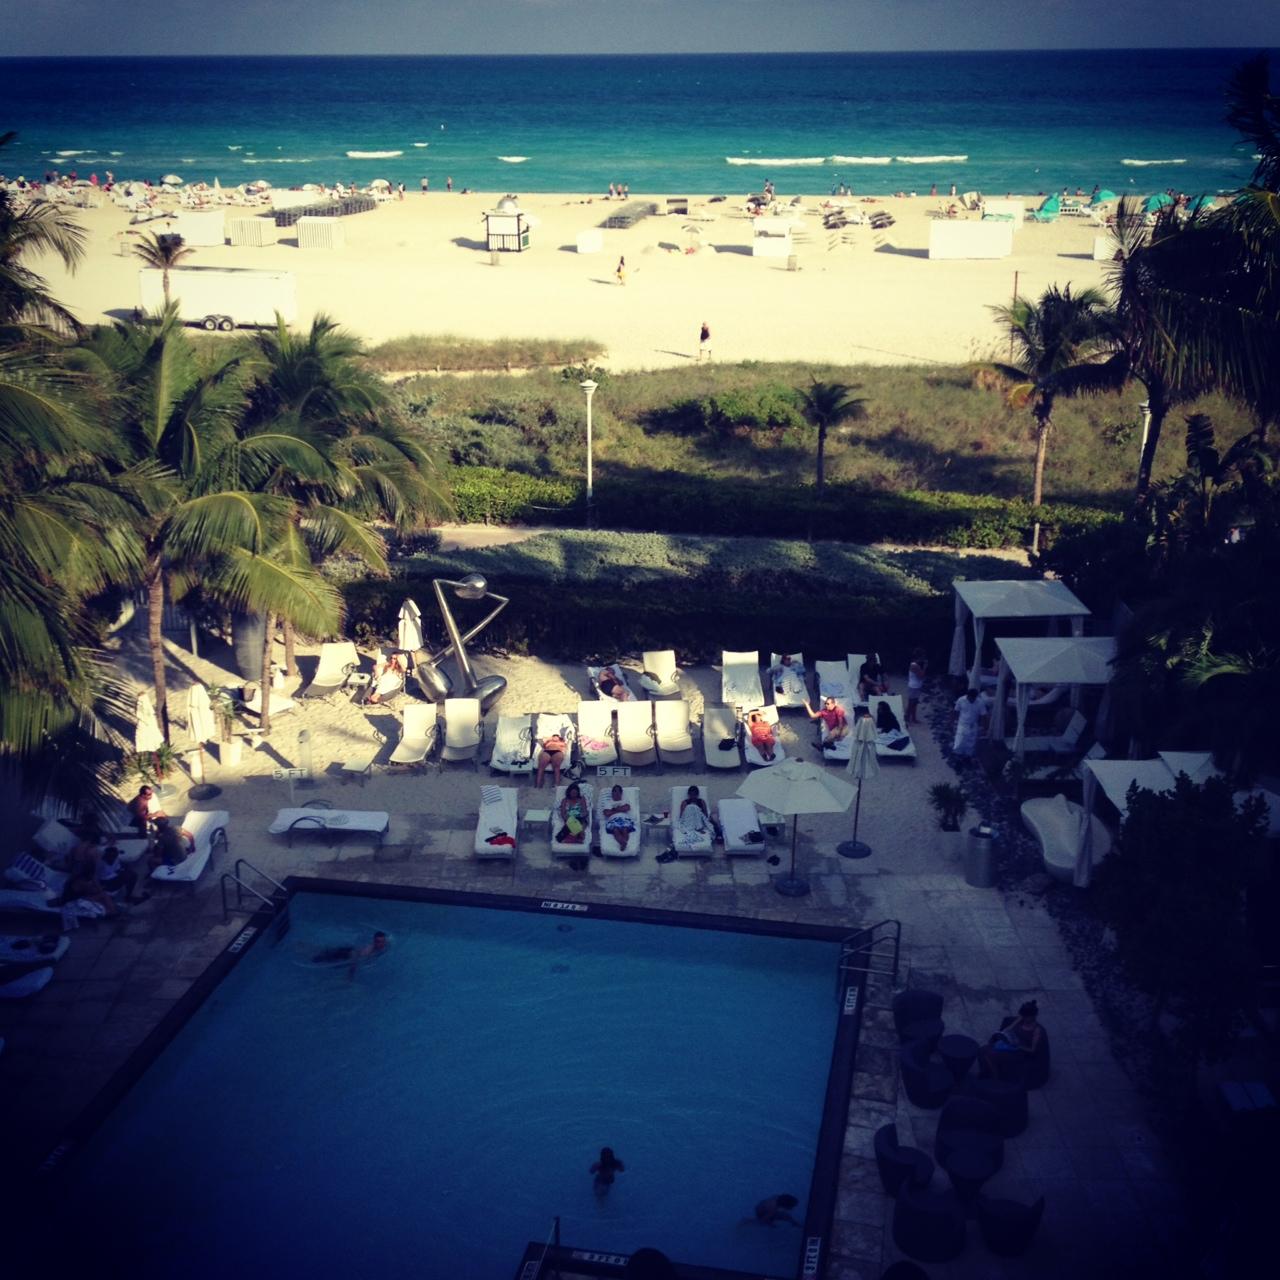 Blind Stab South Beach Miami Florida Instagram 19